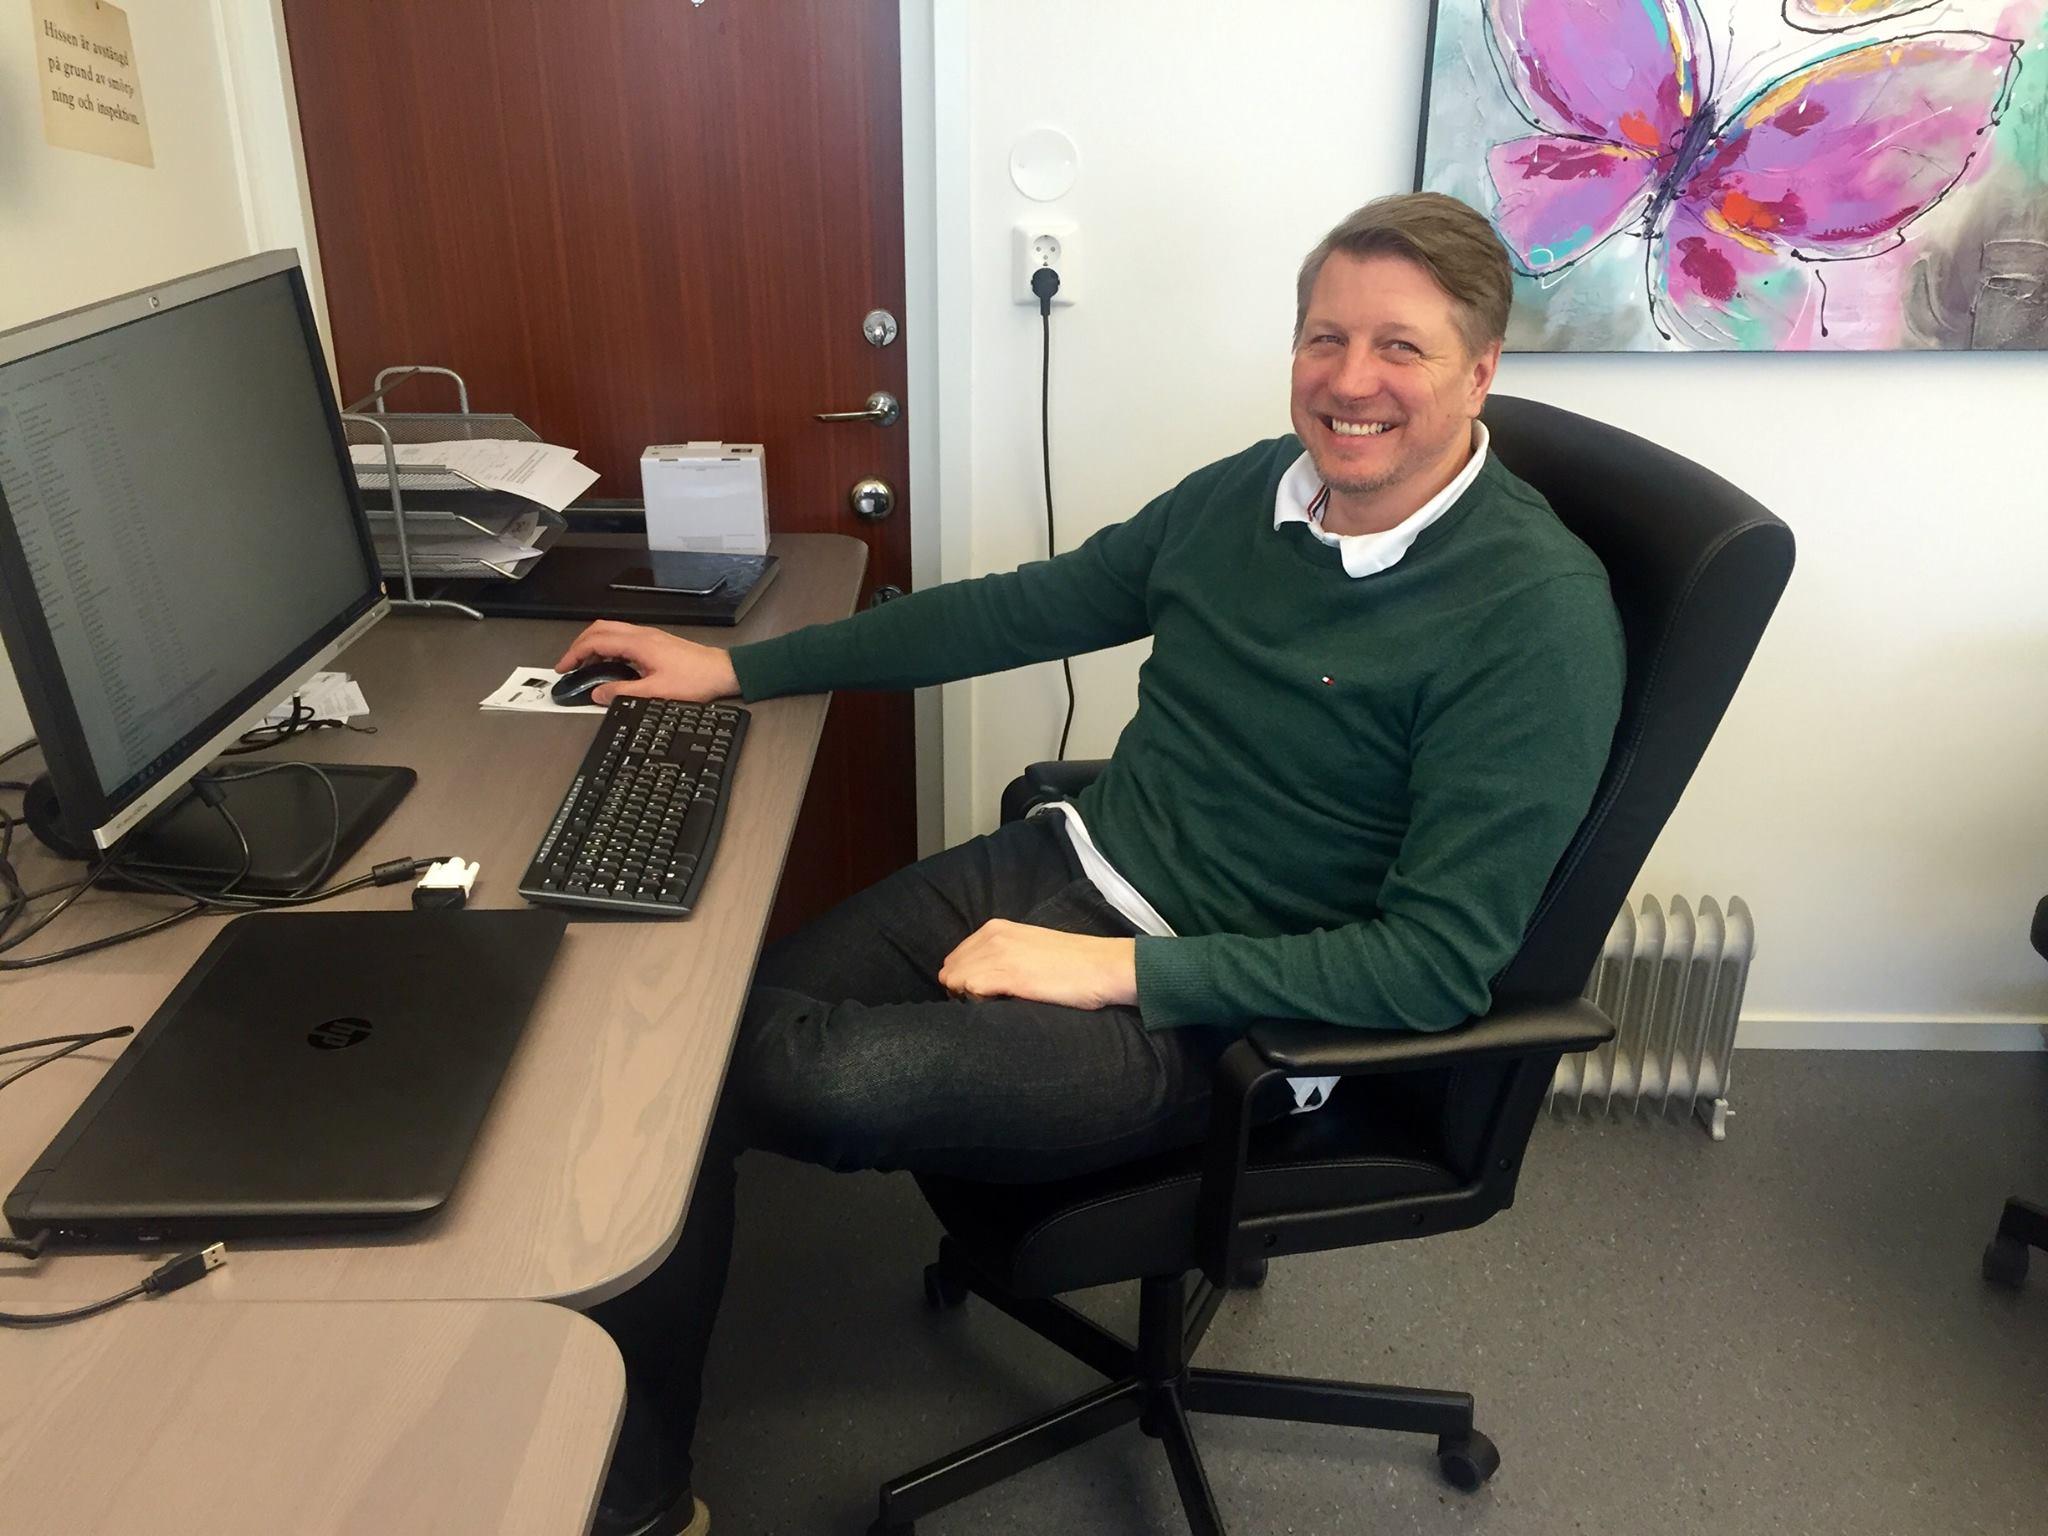 Anders Wiberg Hisskonsult